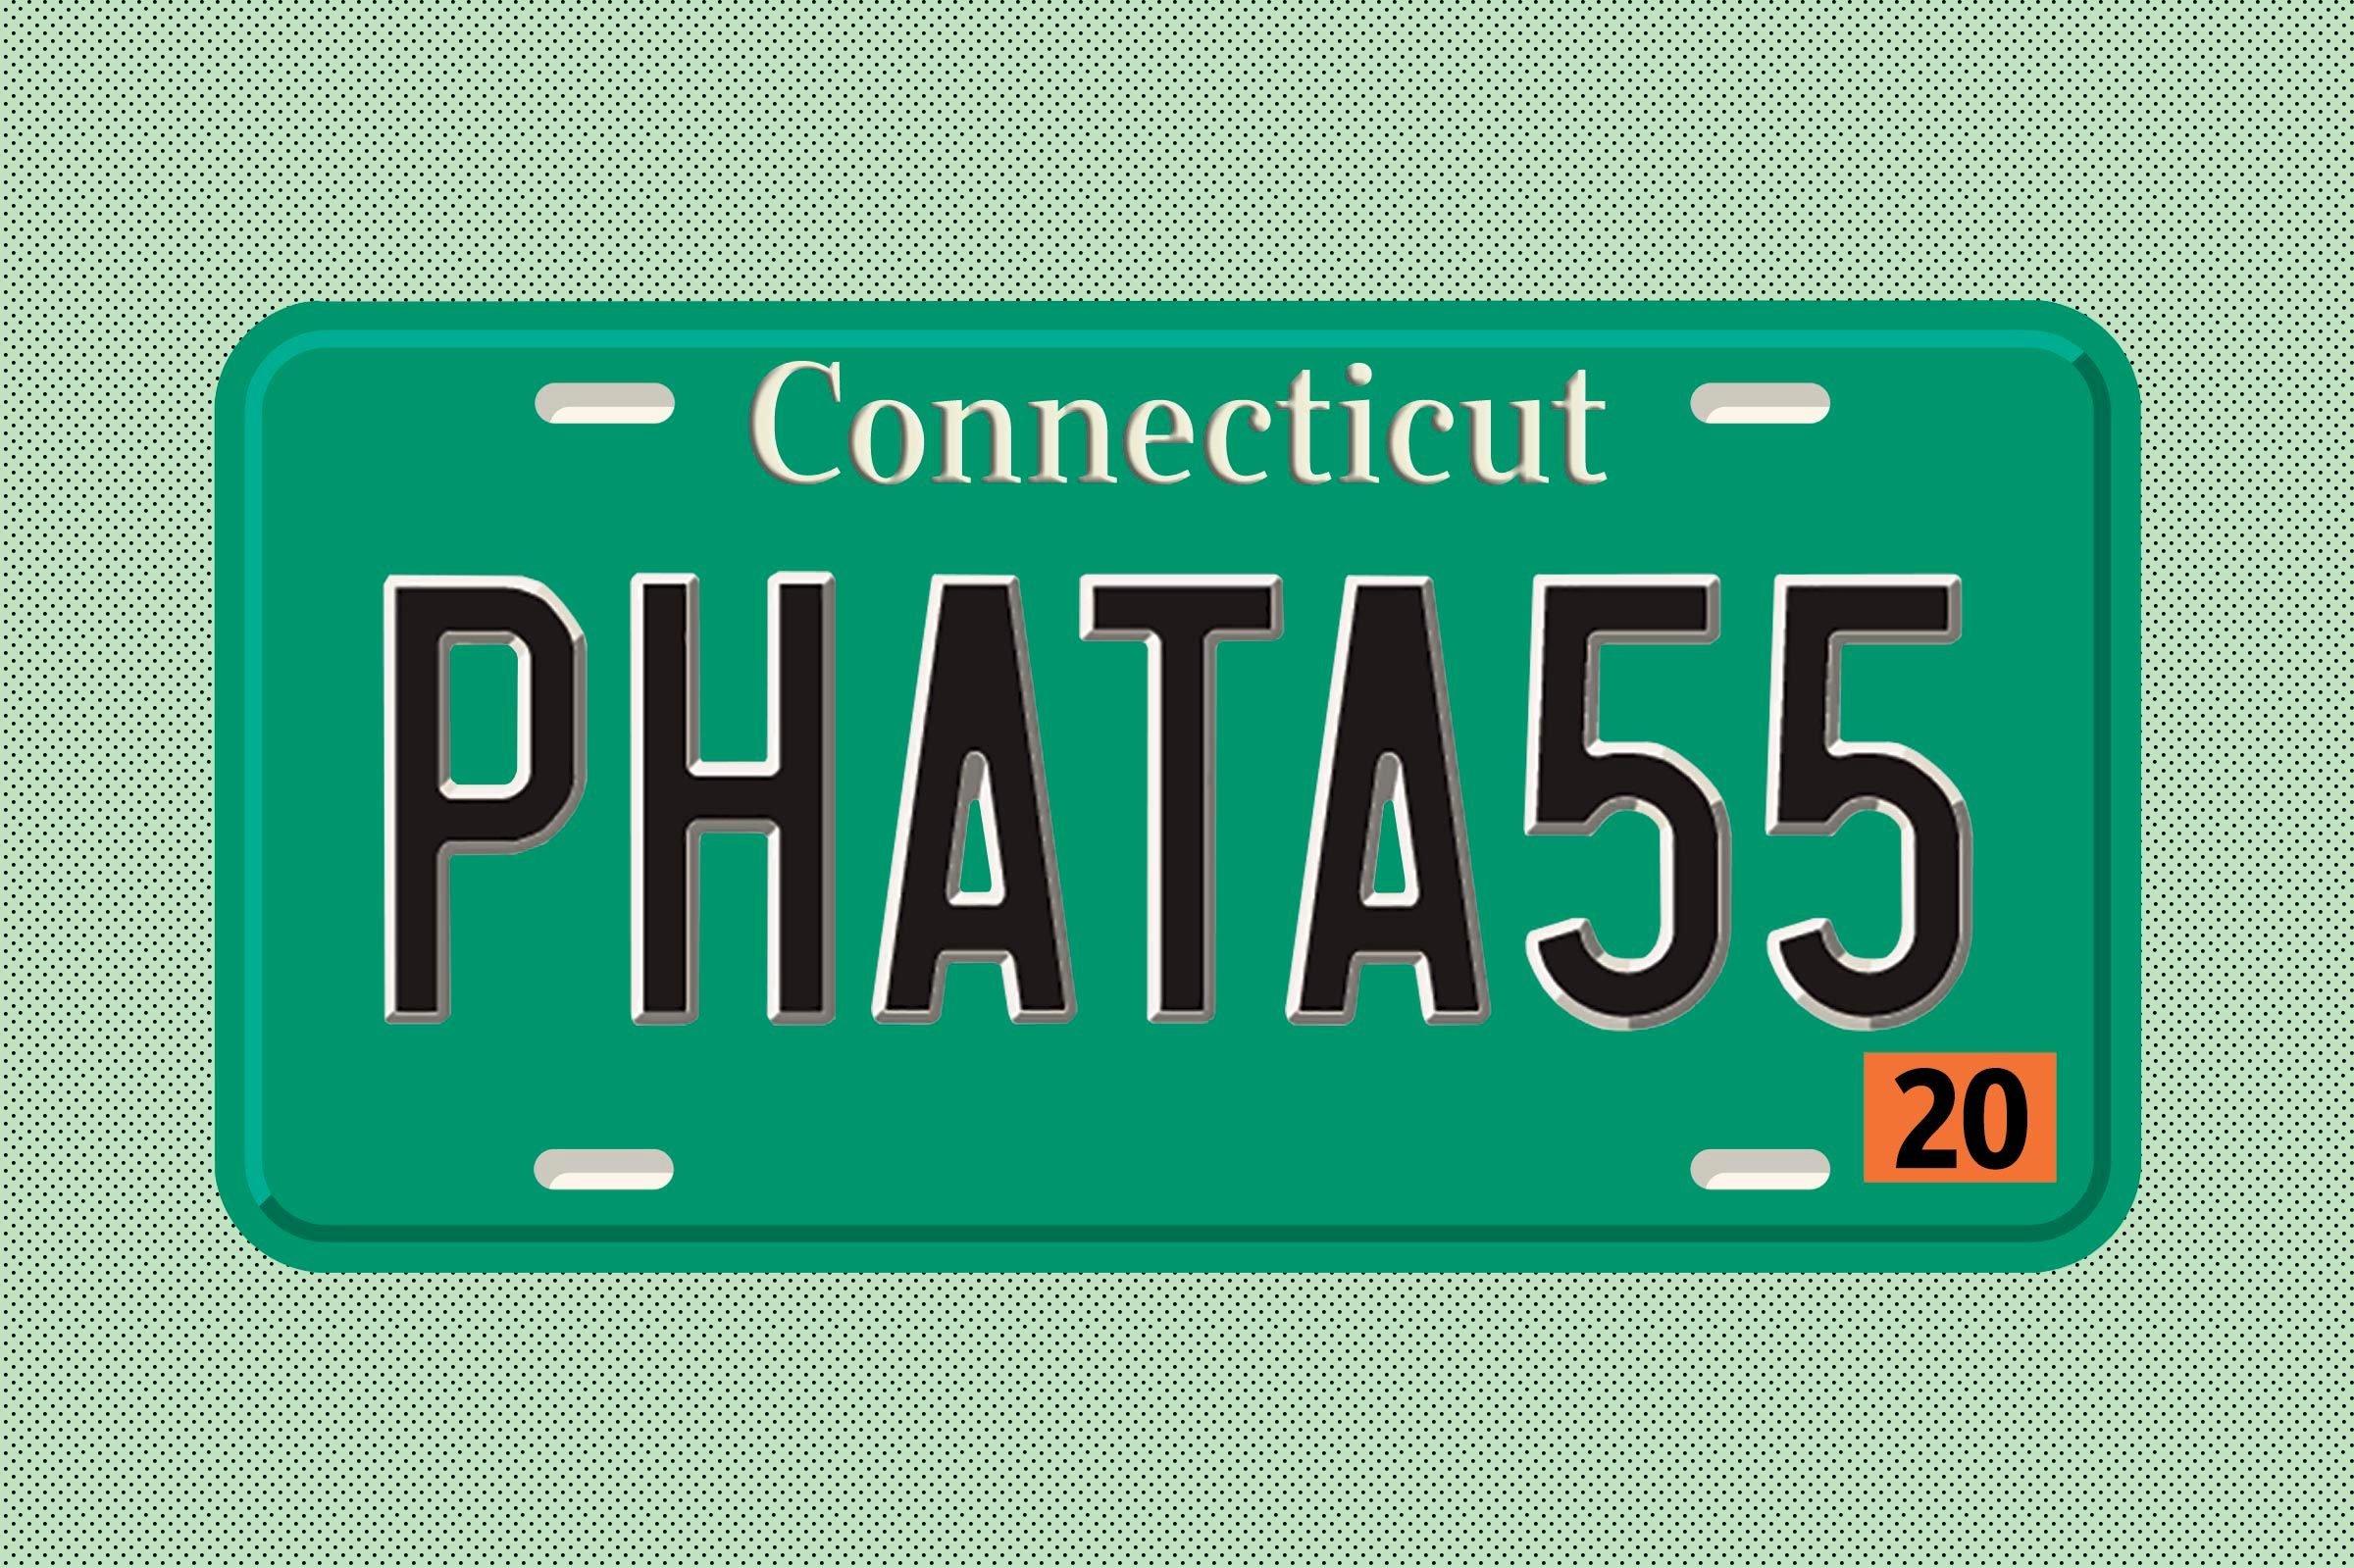 PHATA55